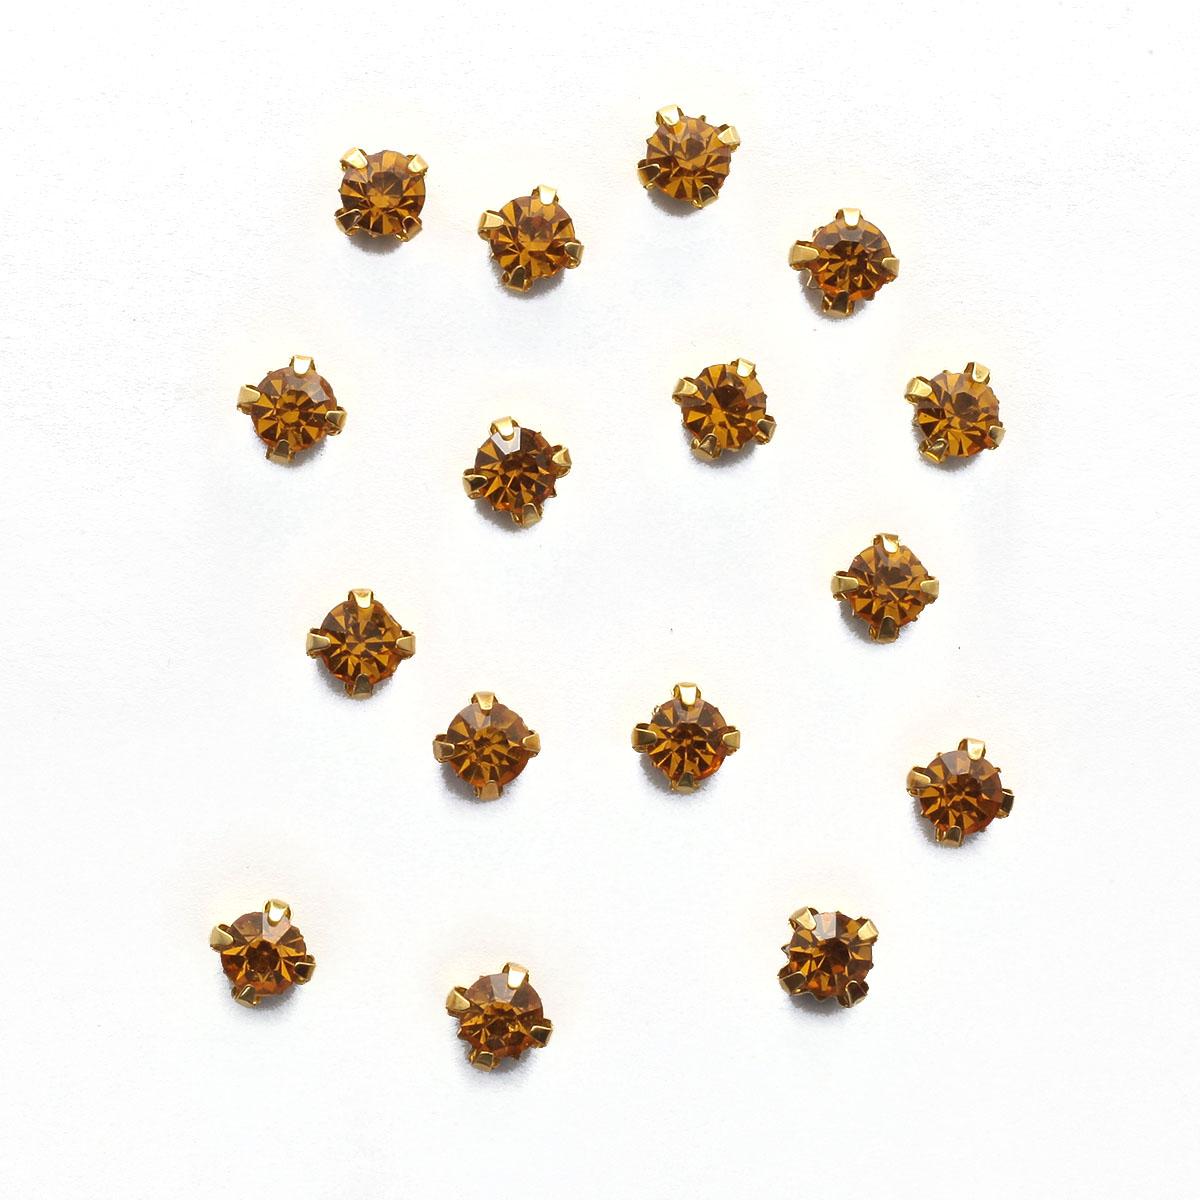 ЗЦ013НН66 Хрустальные стразы в цапах круглые (золото) медовый 6*6мм, 20шт/упак Астра